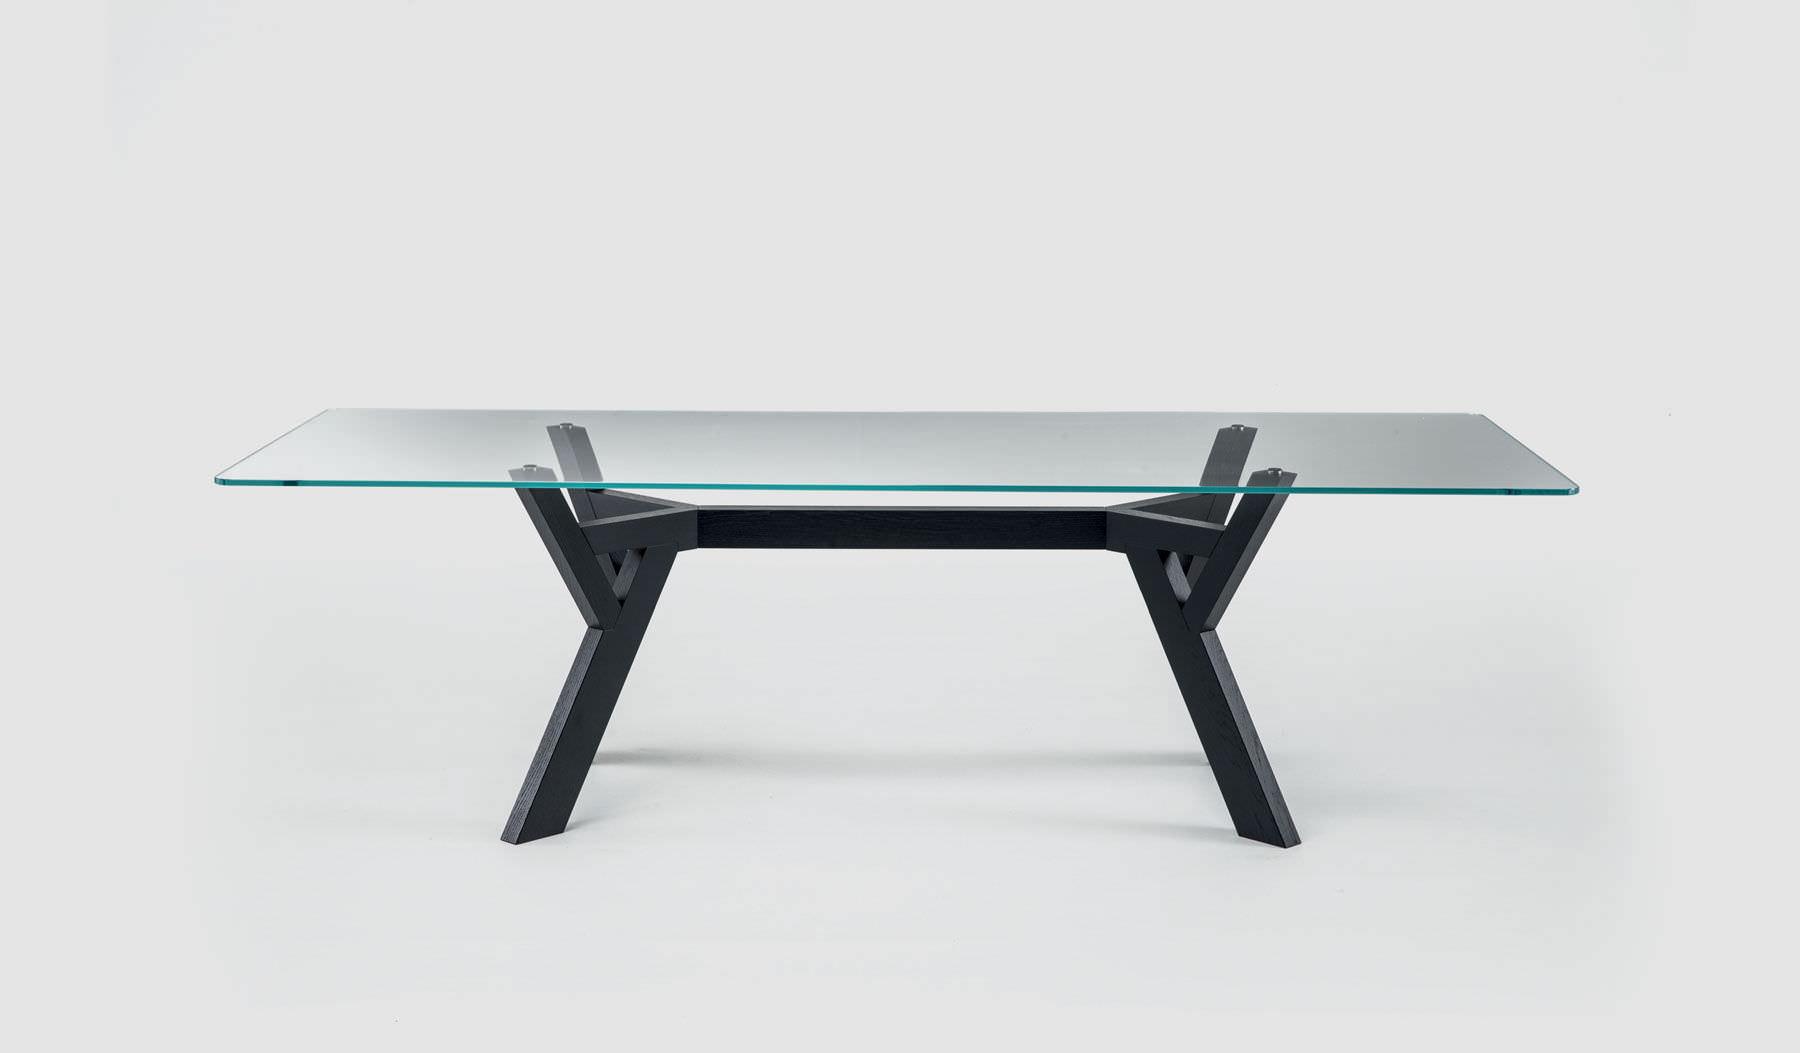 contemporary table  wooden  glass  marble  trigono by enzo  -  contemporary table  wooden  glass  marble trigono by enzo bertibross italia